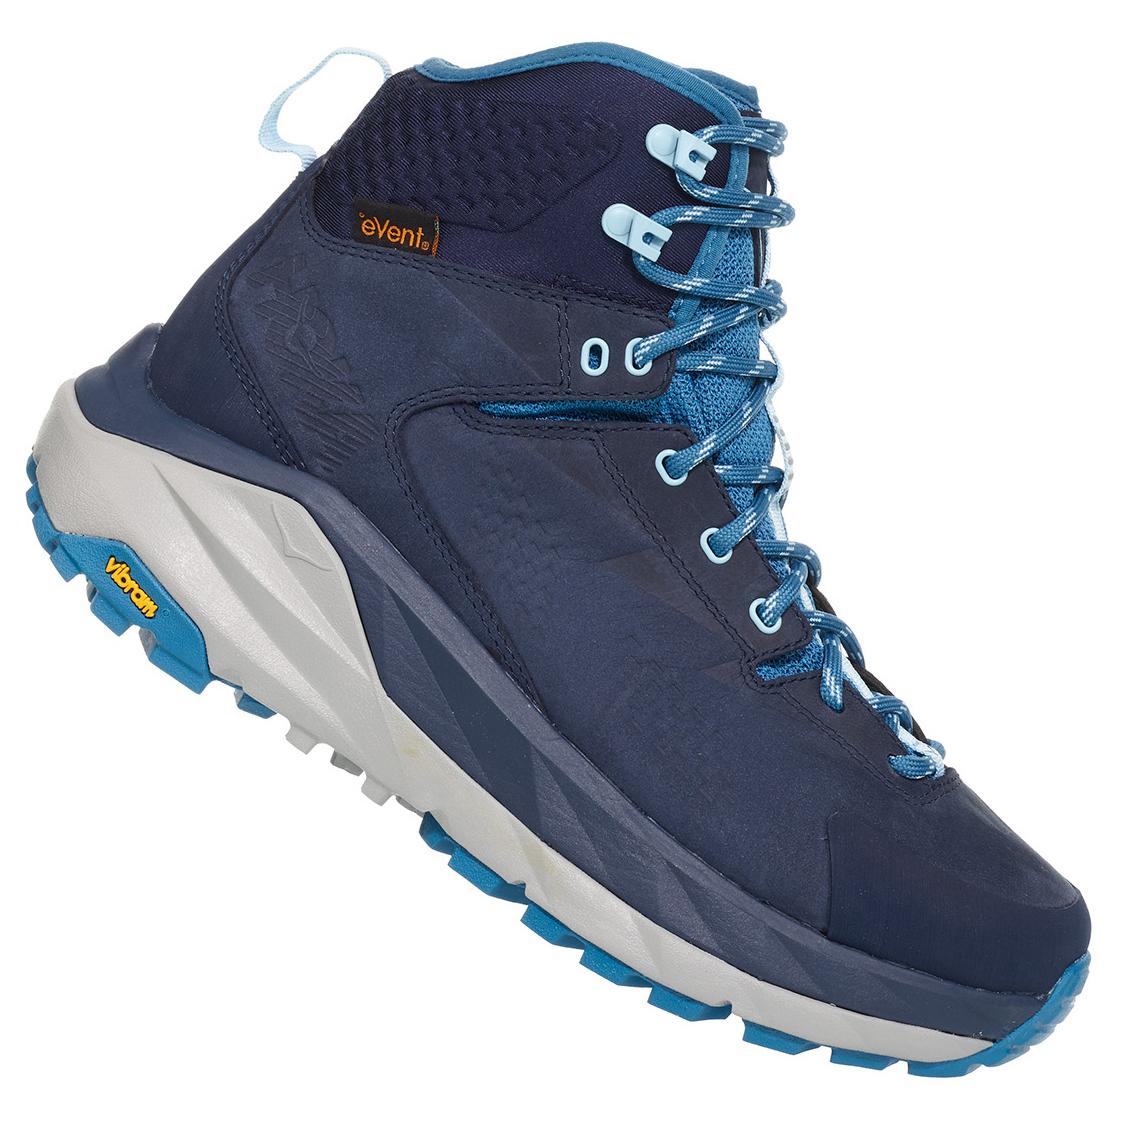 chaussures de randonnée hoka femme